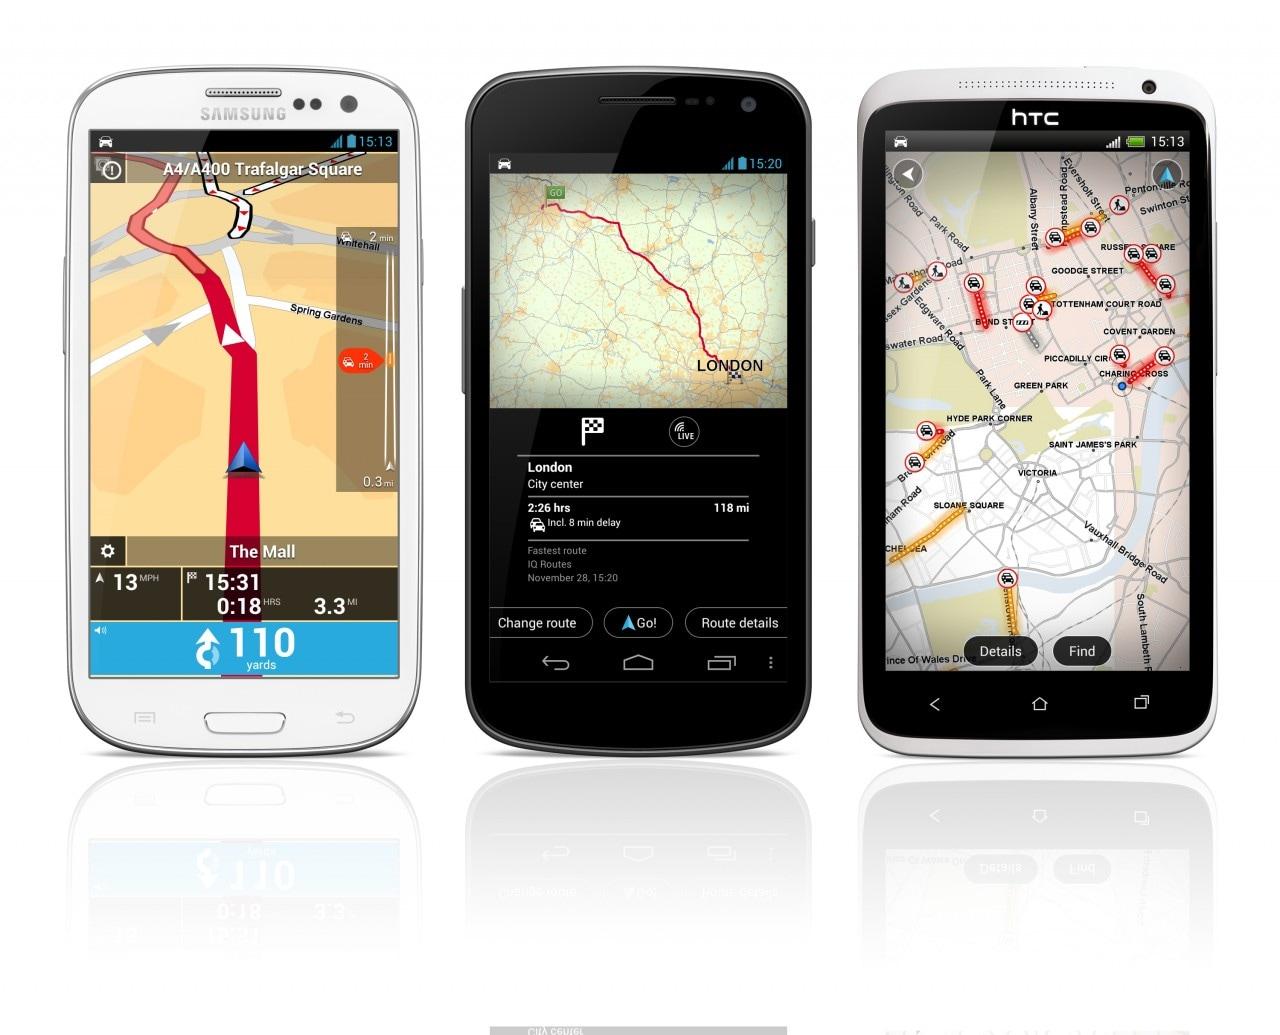 UK_Android_phones_720x1280_72dpi.jpg